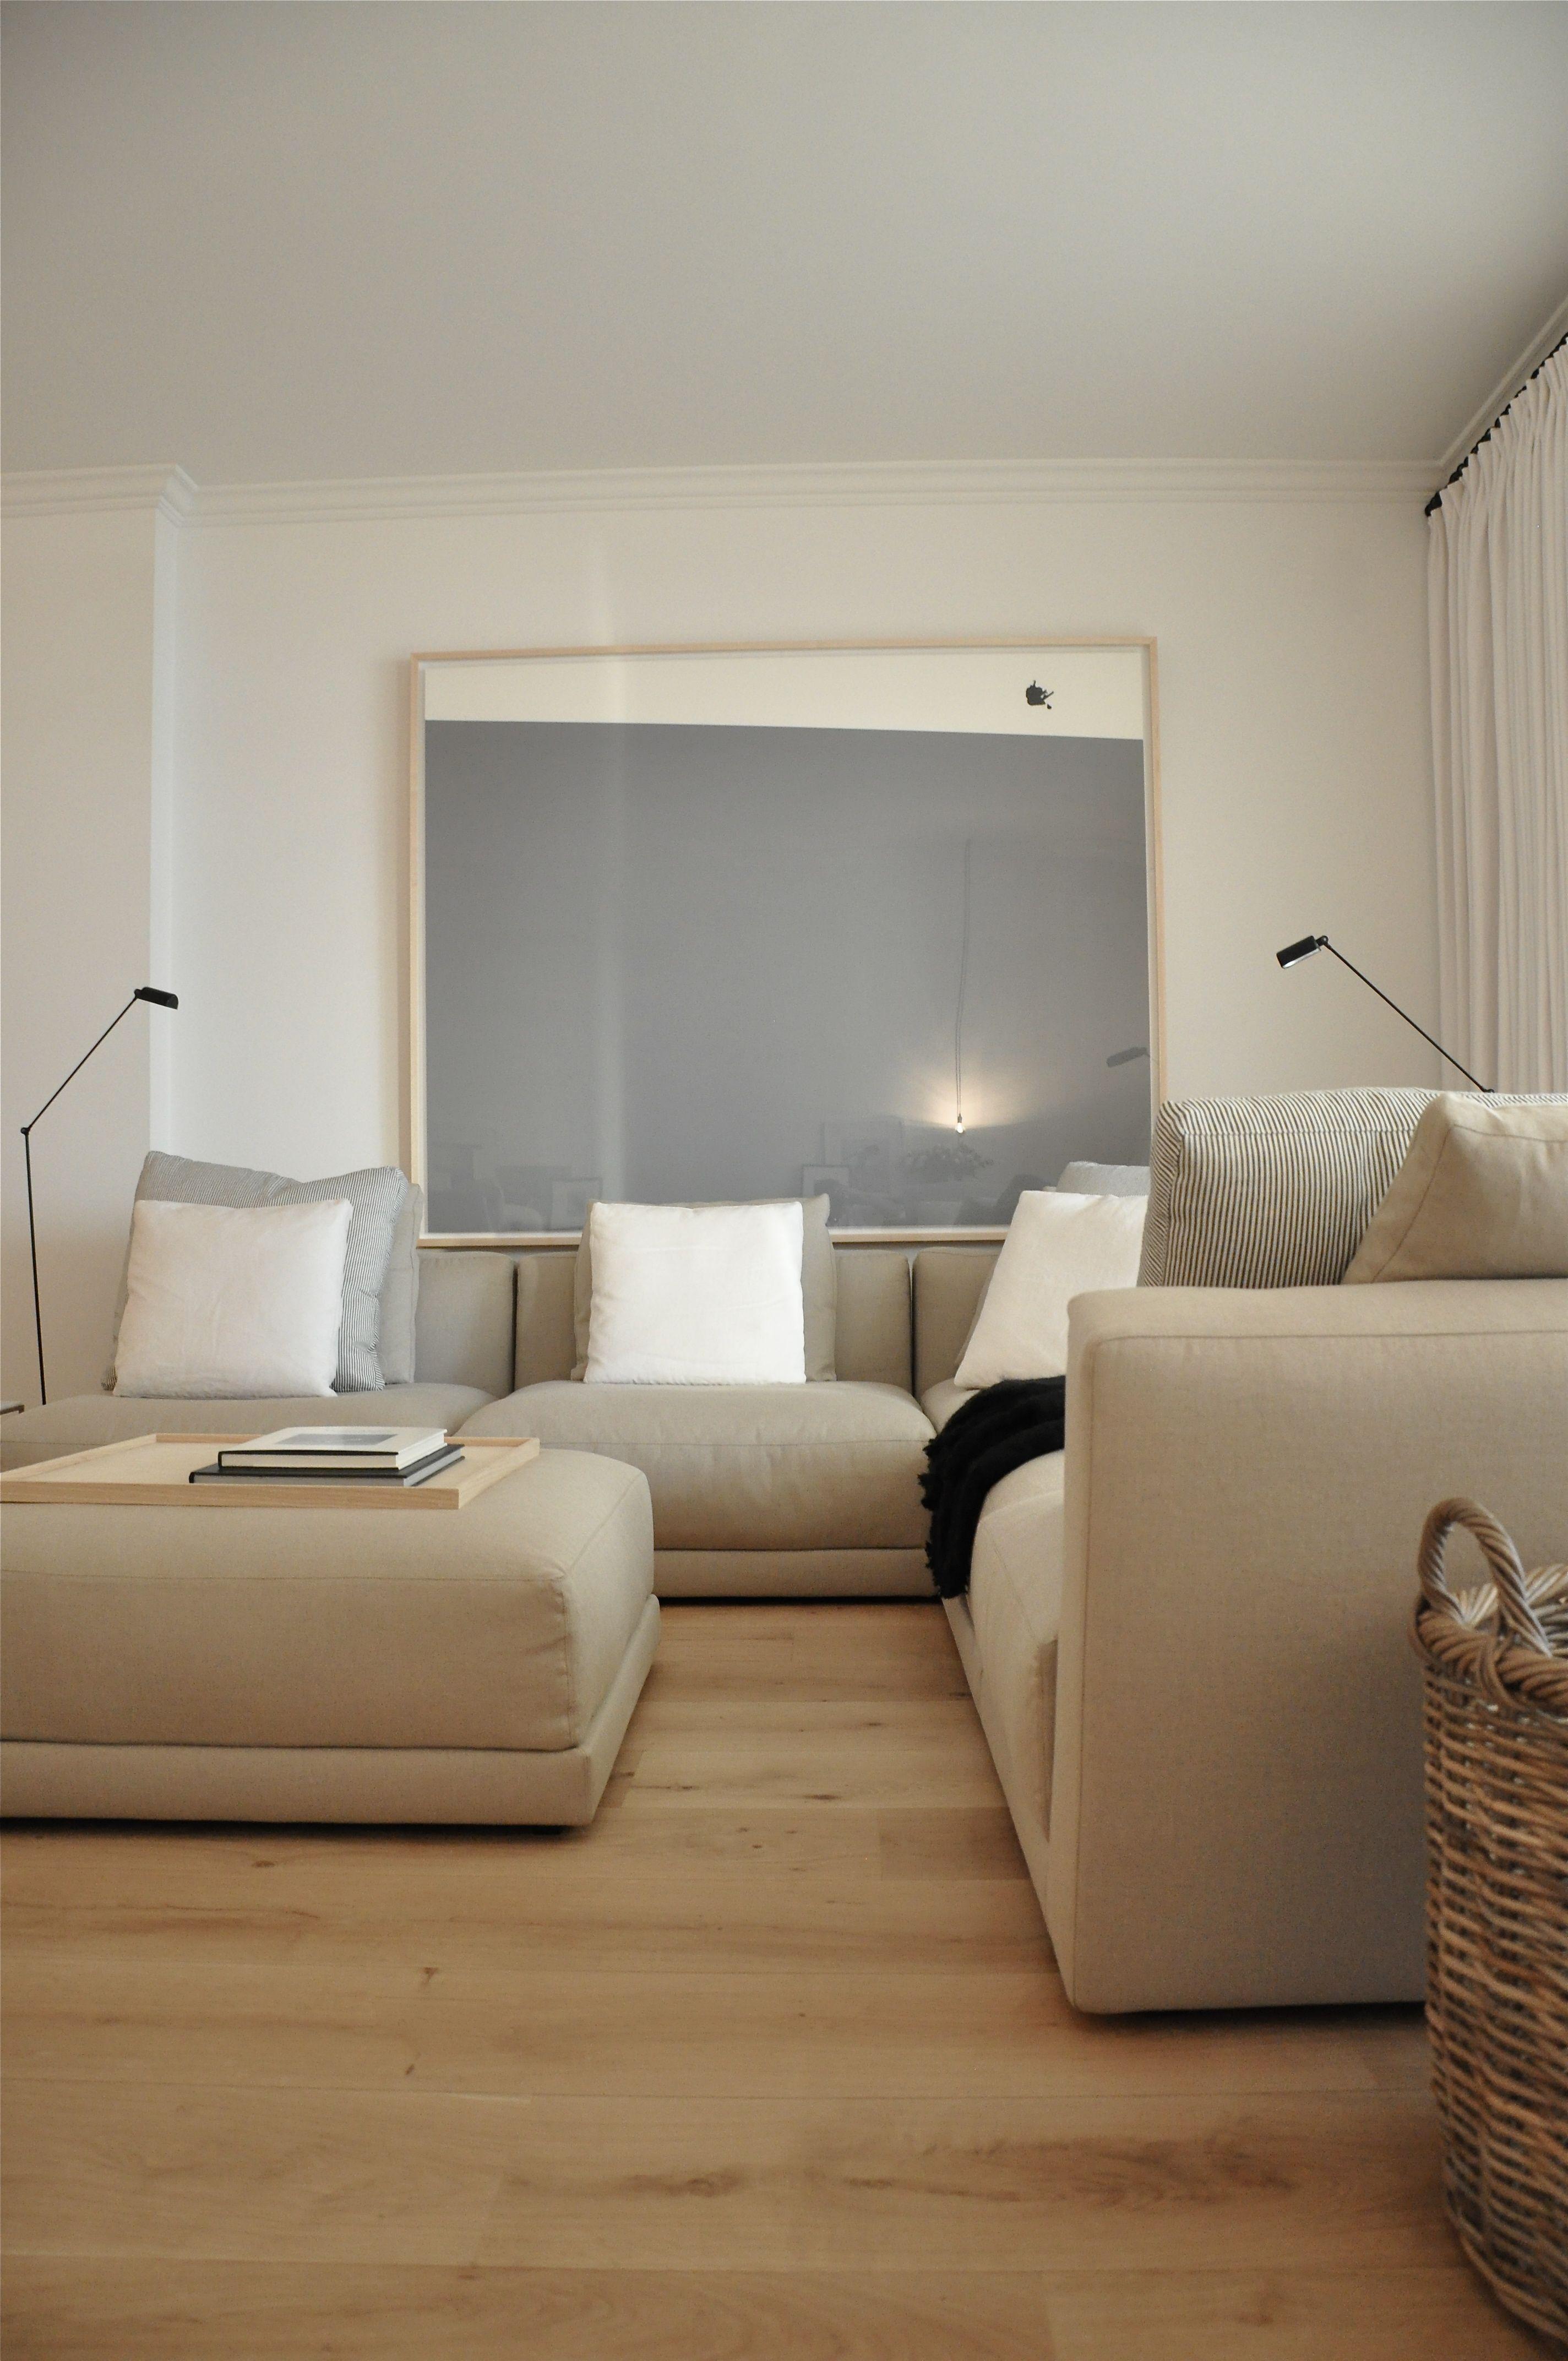 Living Room Interior Design Pdf: Briggs Edward Solomon, Beige Lounge